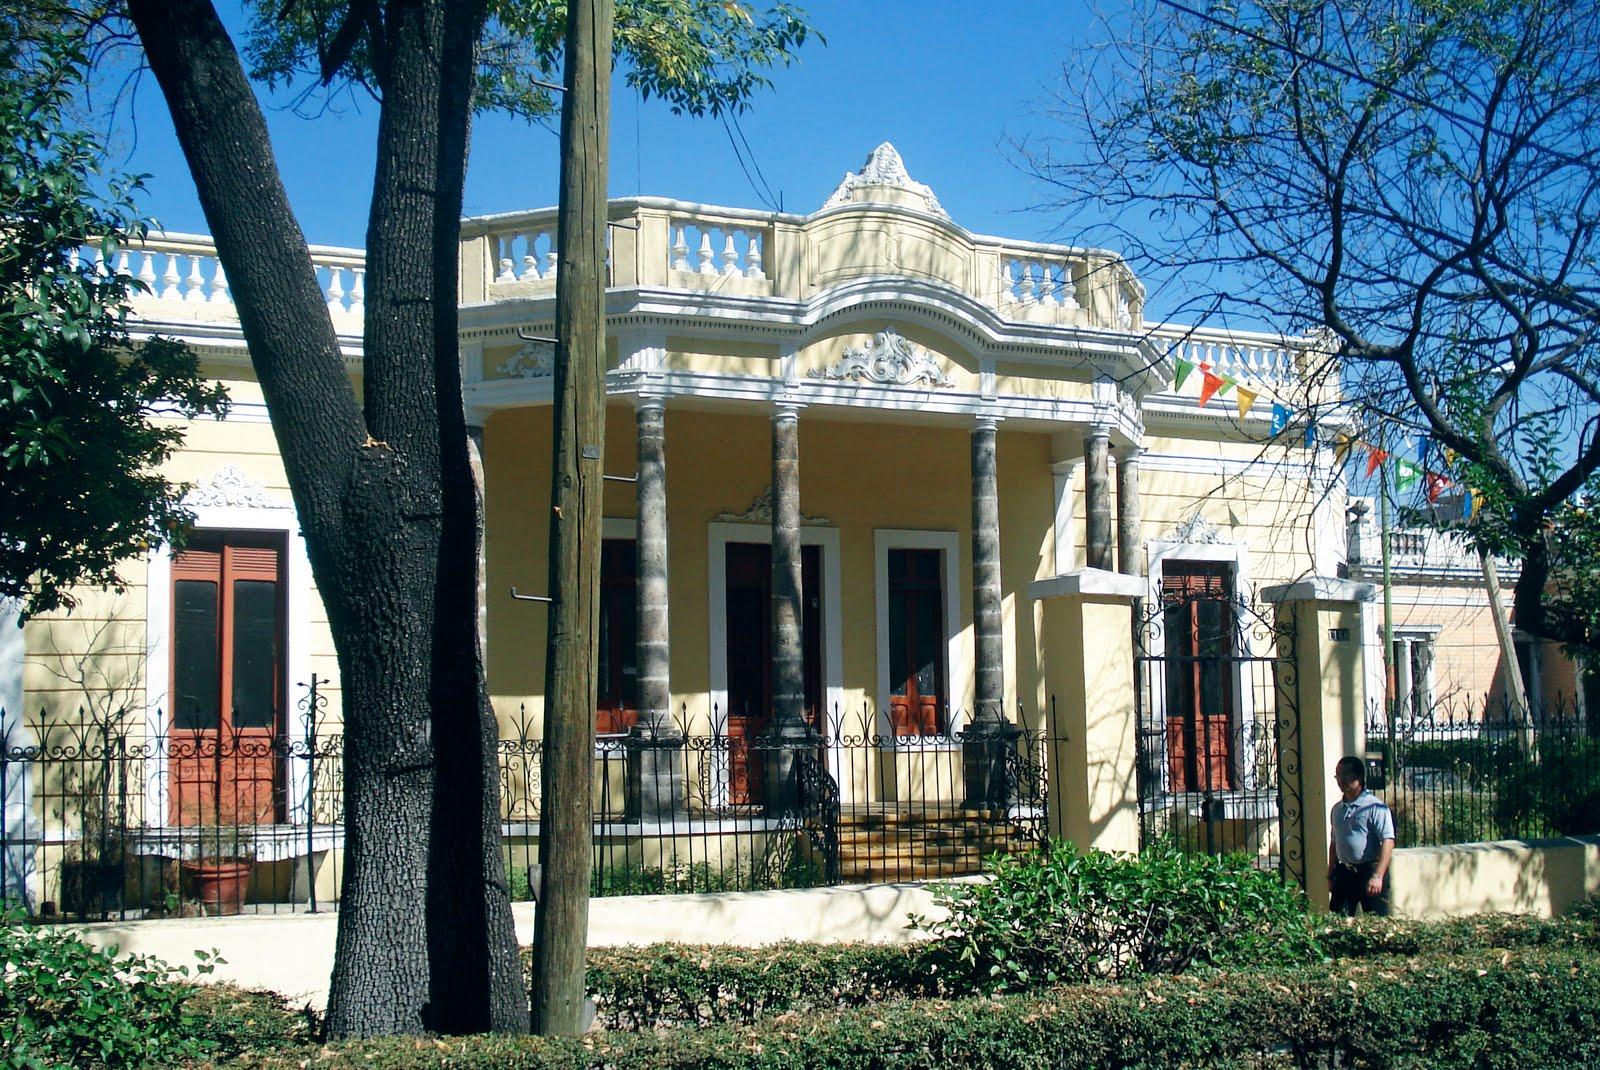 Revisiones de guadalajara ficha av vallarta 1168 casa for Arquitectura eclectica